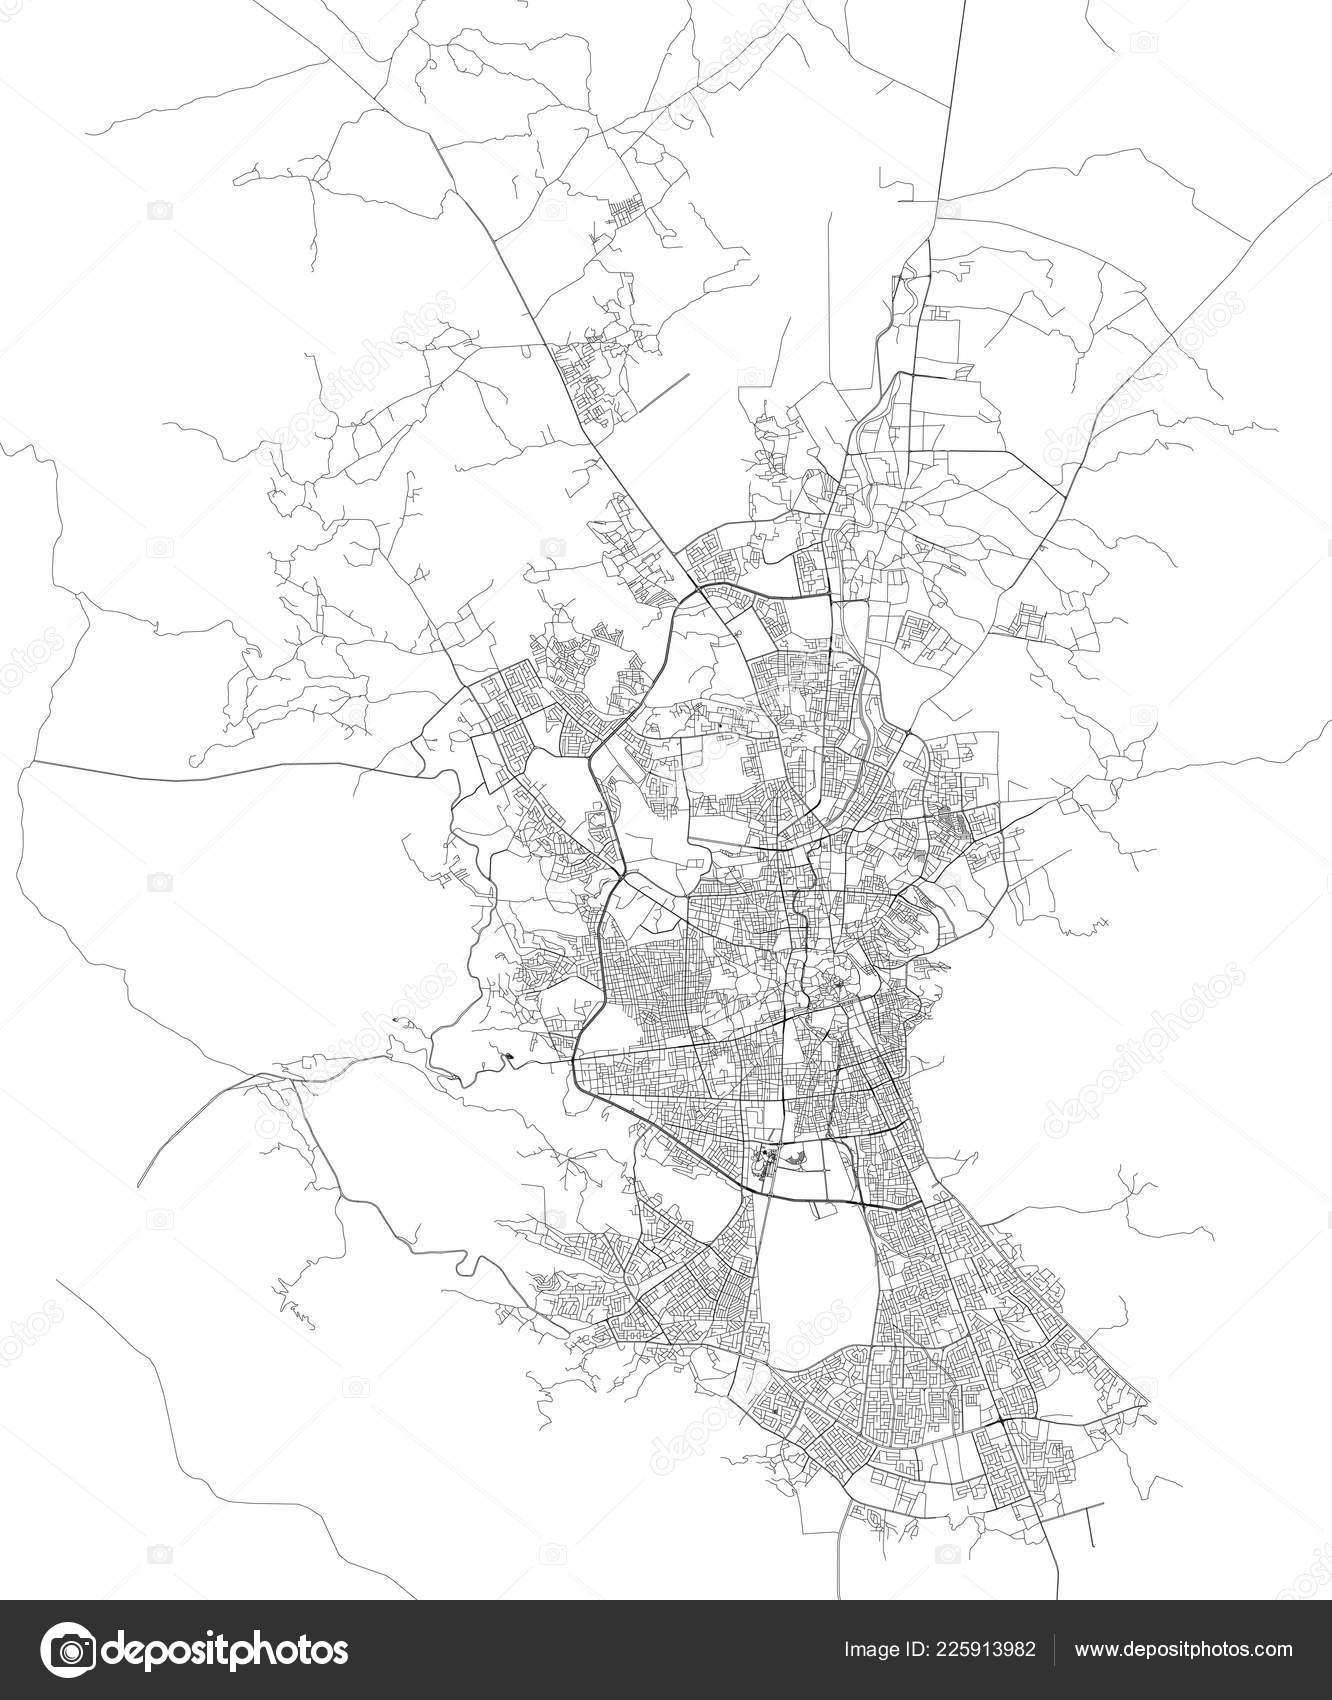 Satellite Map Sana Yemen City Streets Street Map Map City ... on detailed map of yemen, road map of yemen, outline map of yemen, terrain map of yemen, political map of yemen, physical map of yemen, topographic map of yemen,